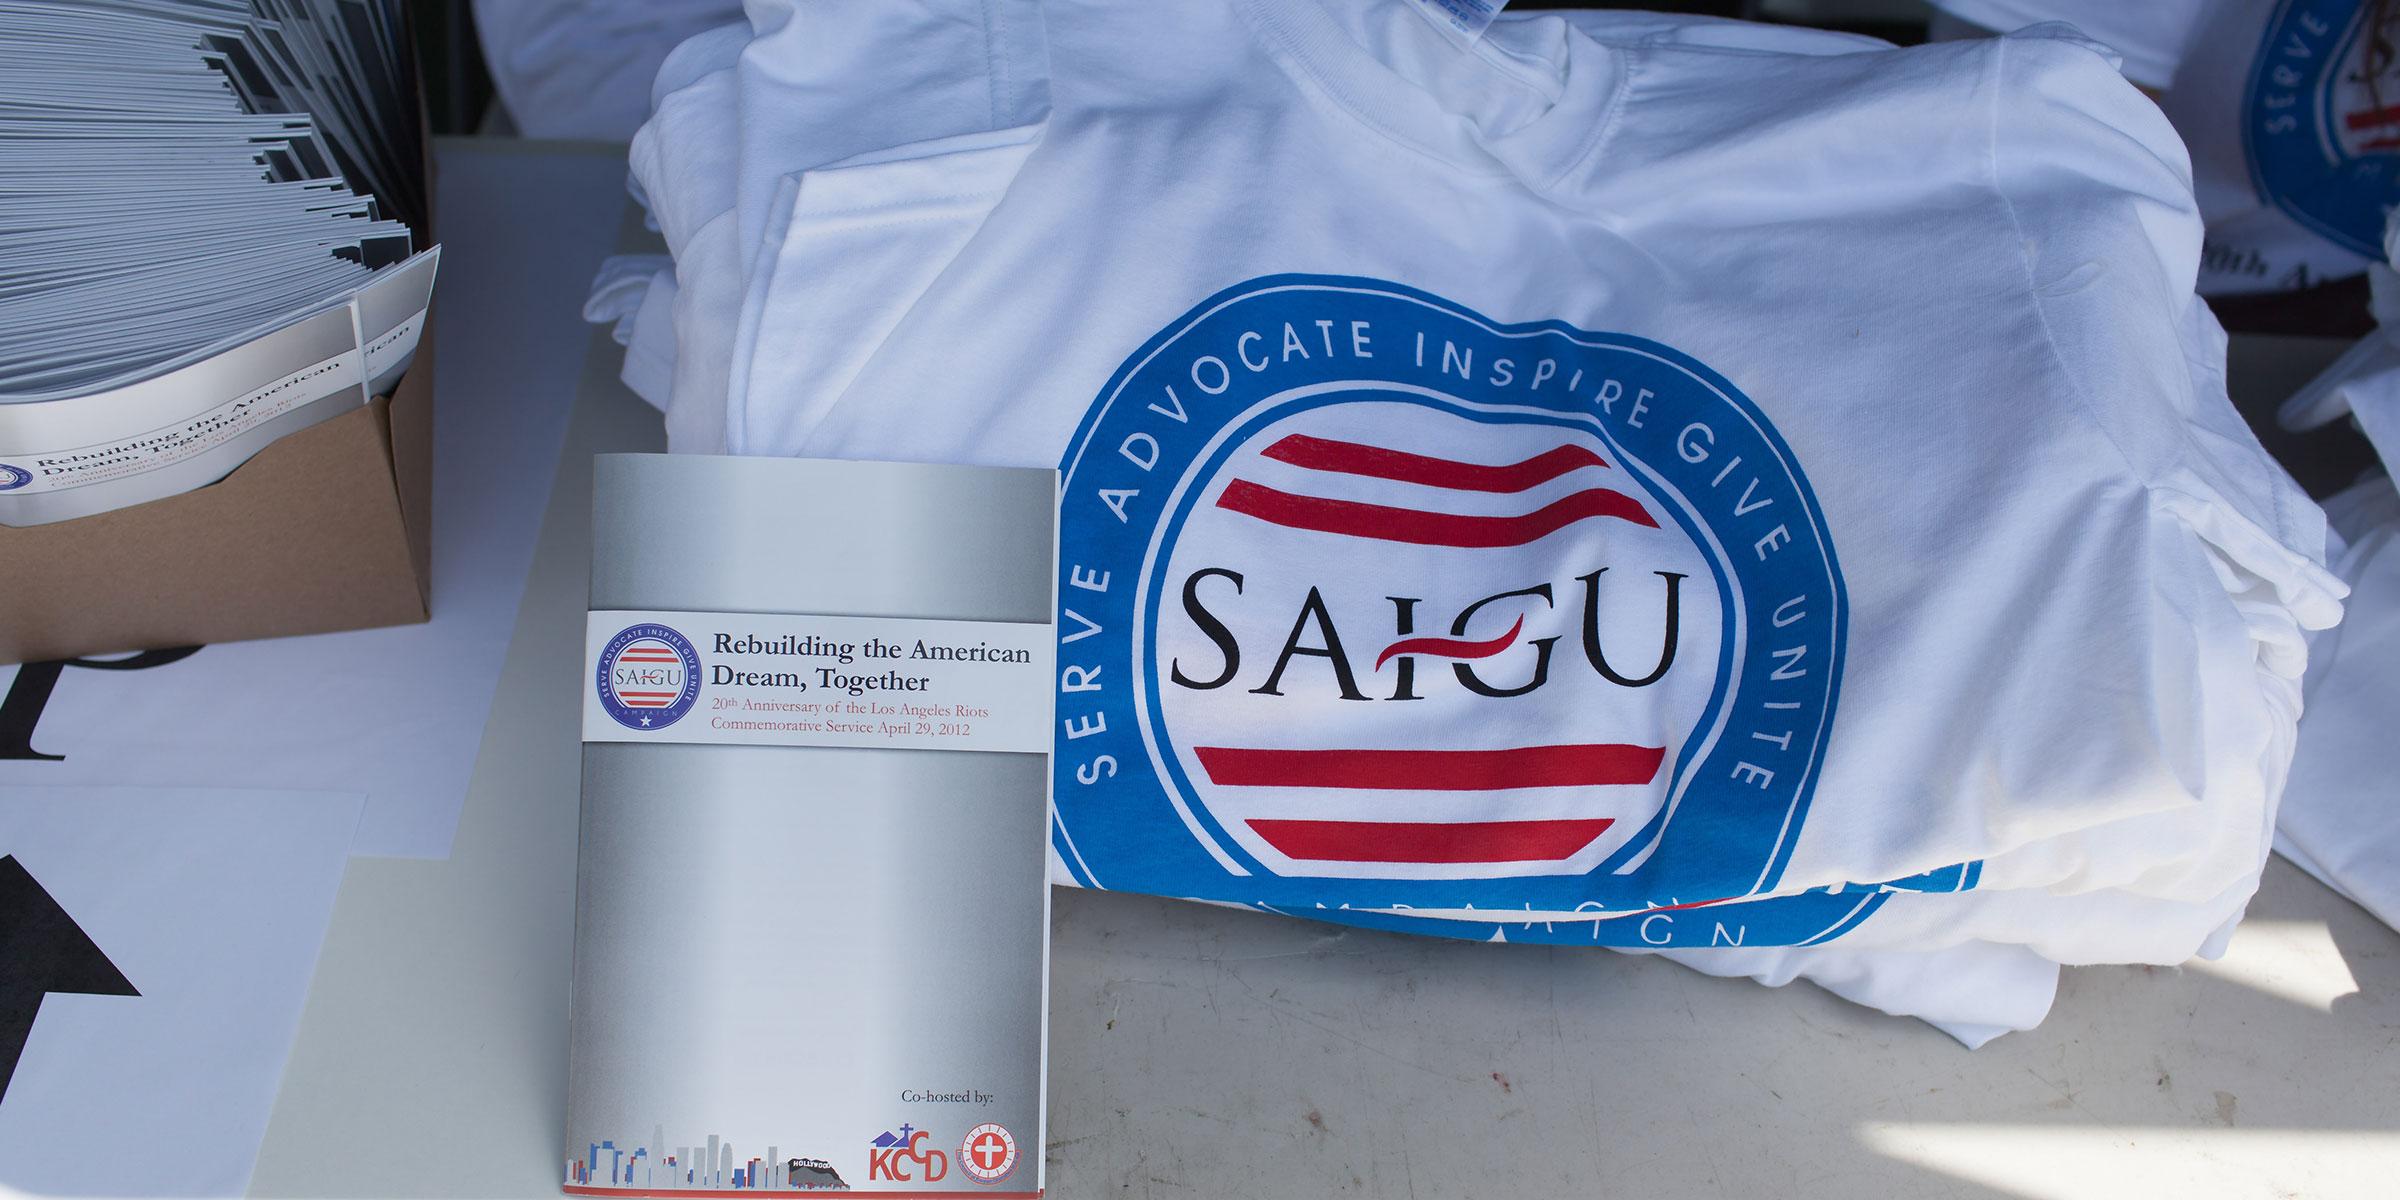 2012 SAIGU Campaign -